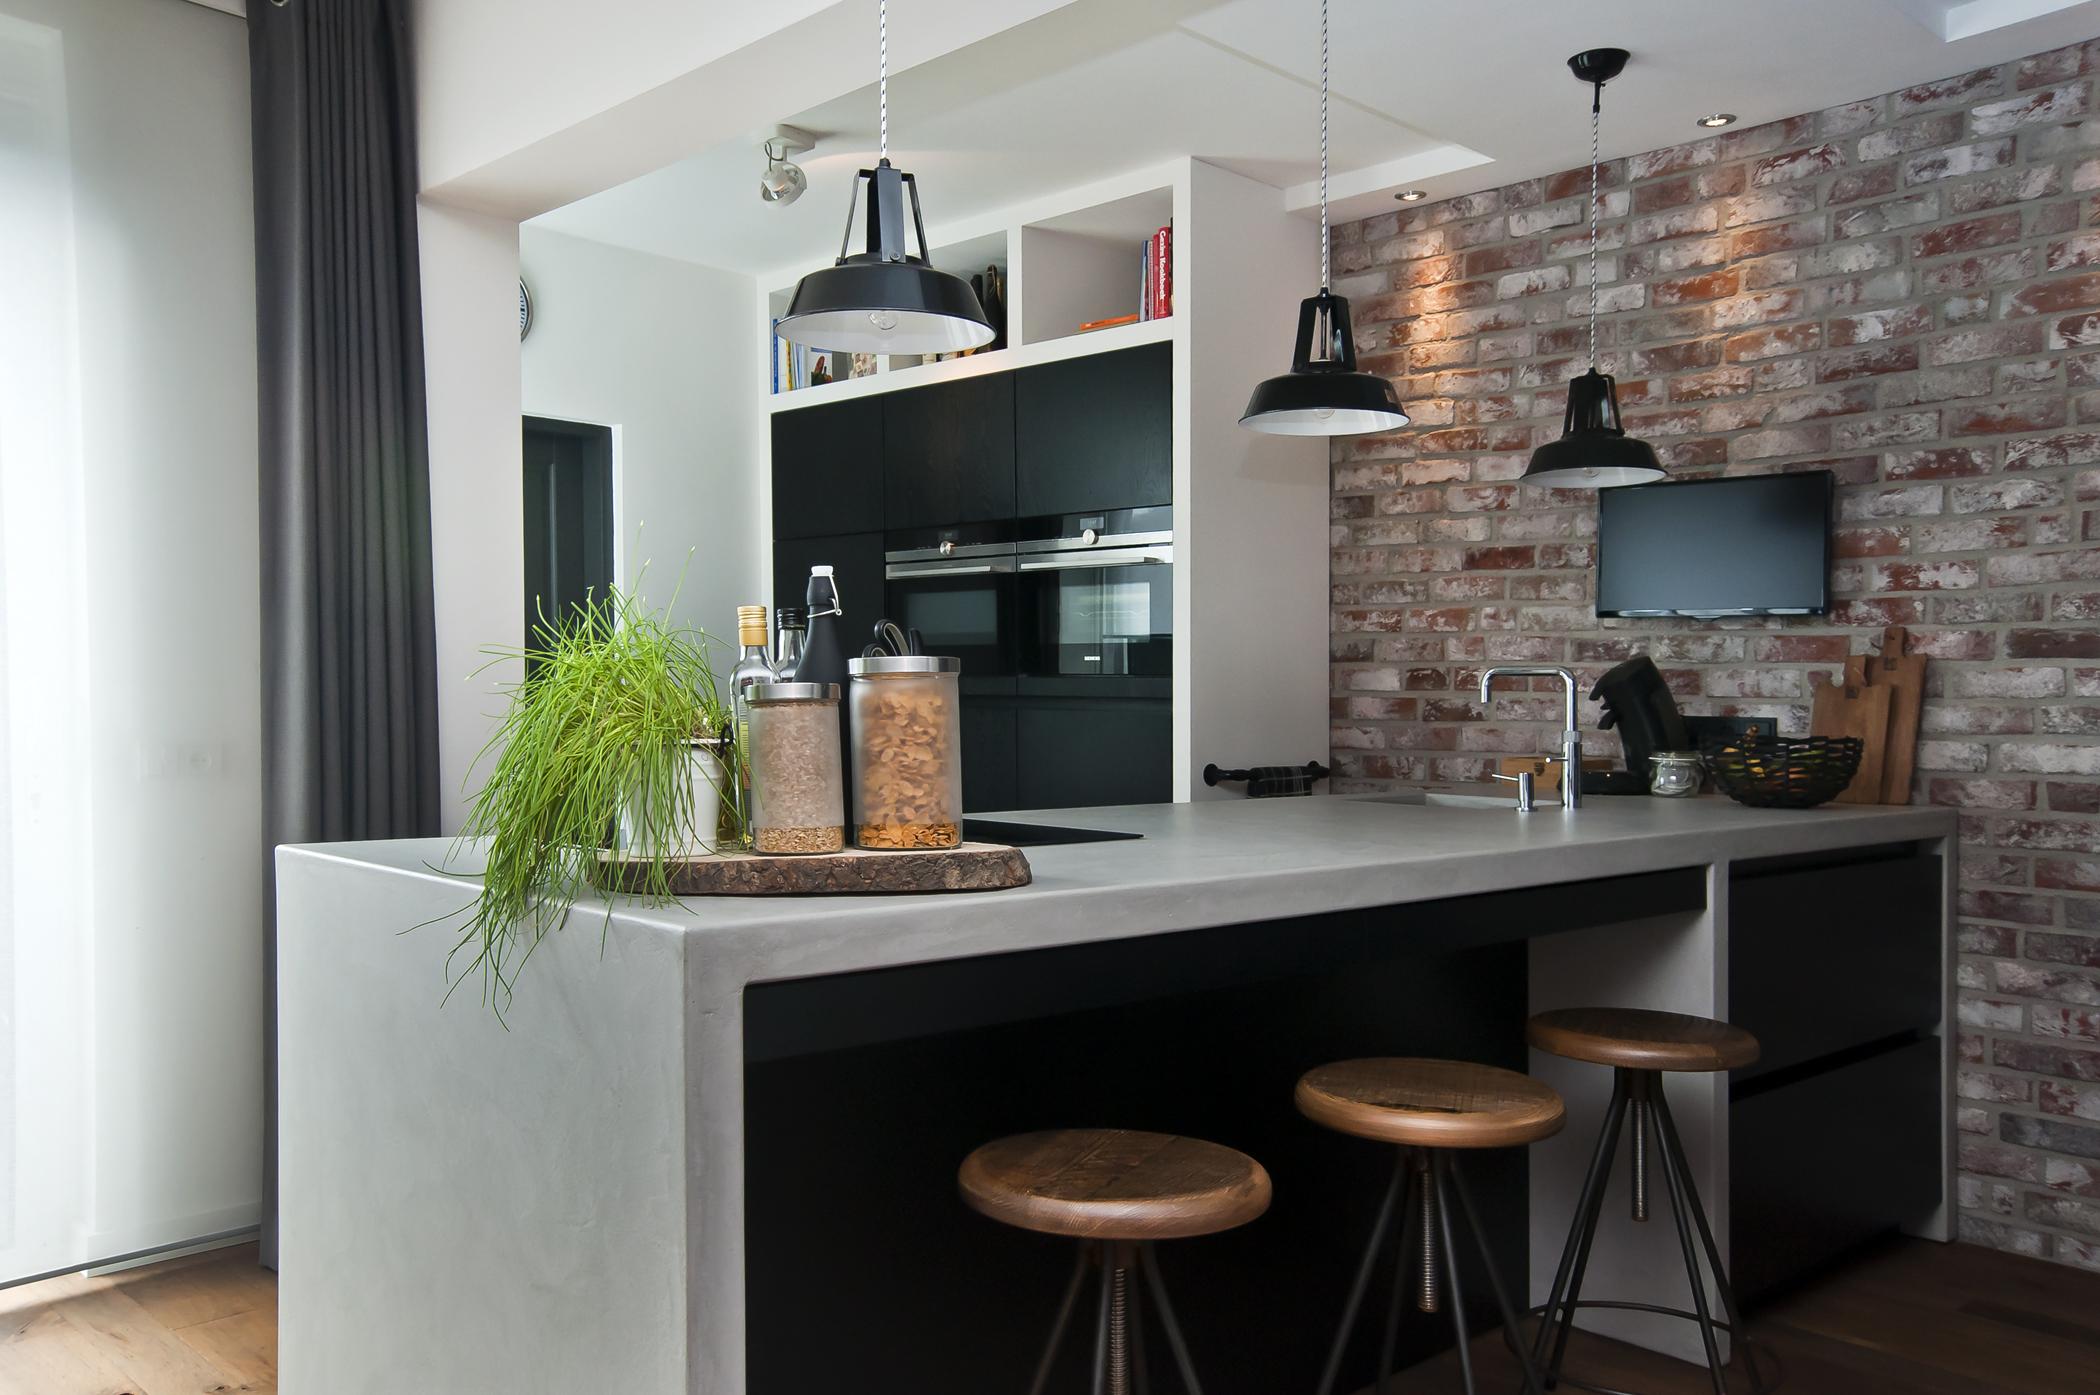 http://thomas.gaspersz.nl/wp-content/uploads/2017/09/Bar-in-keuken-woonkamer-betoncire.jpg